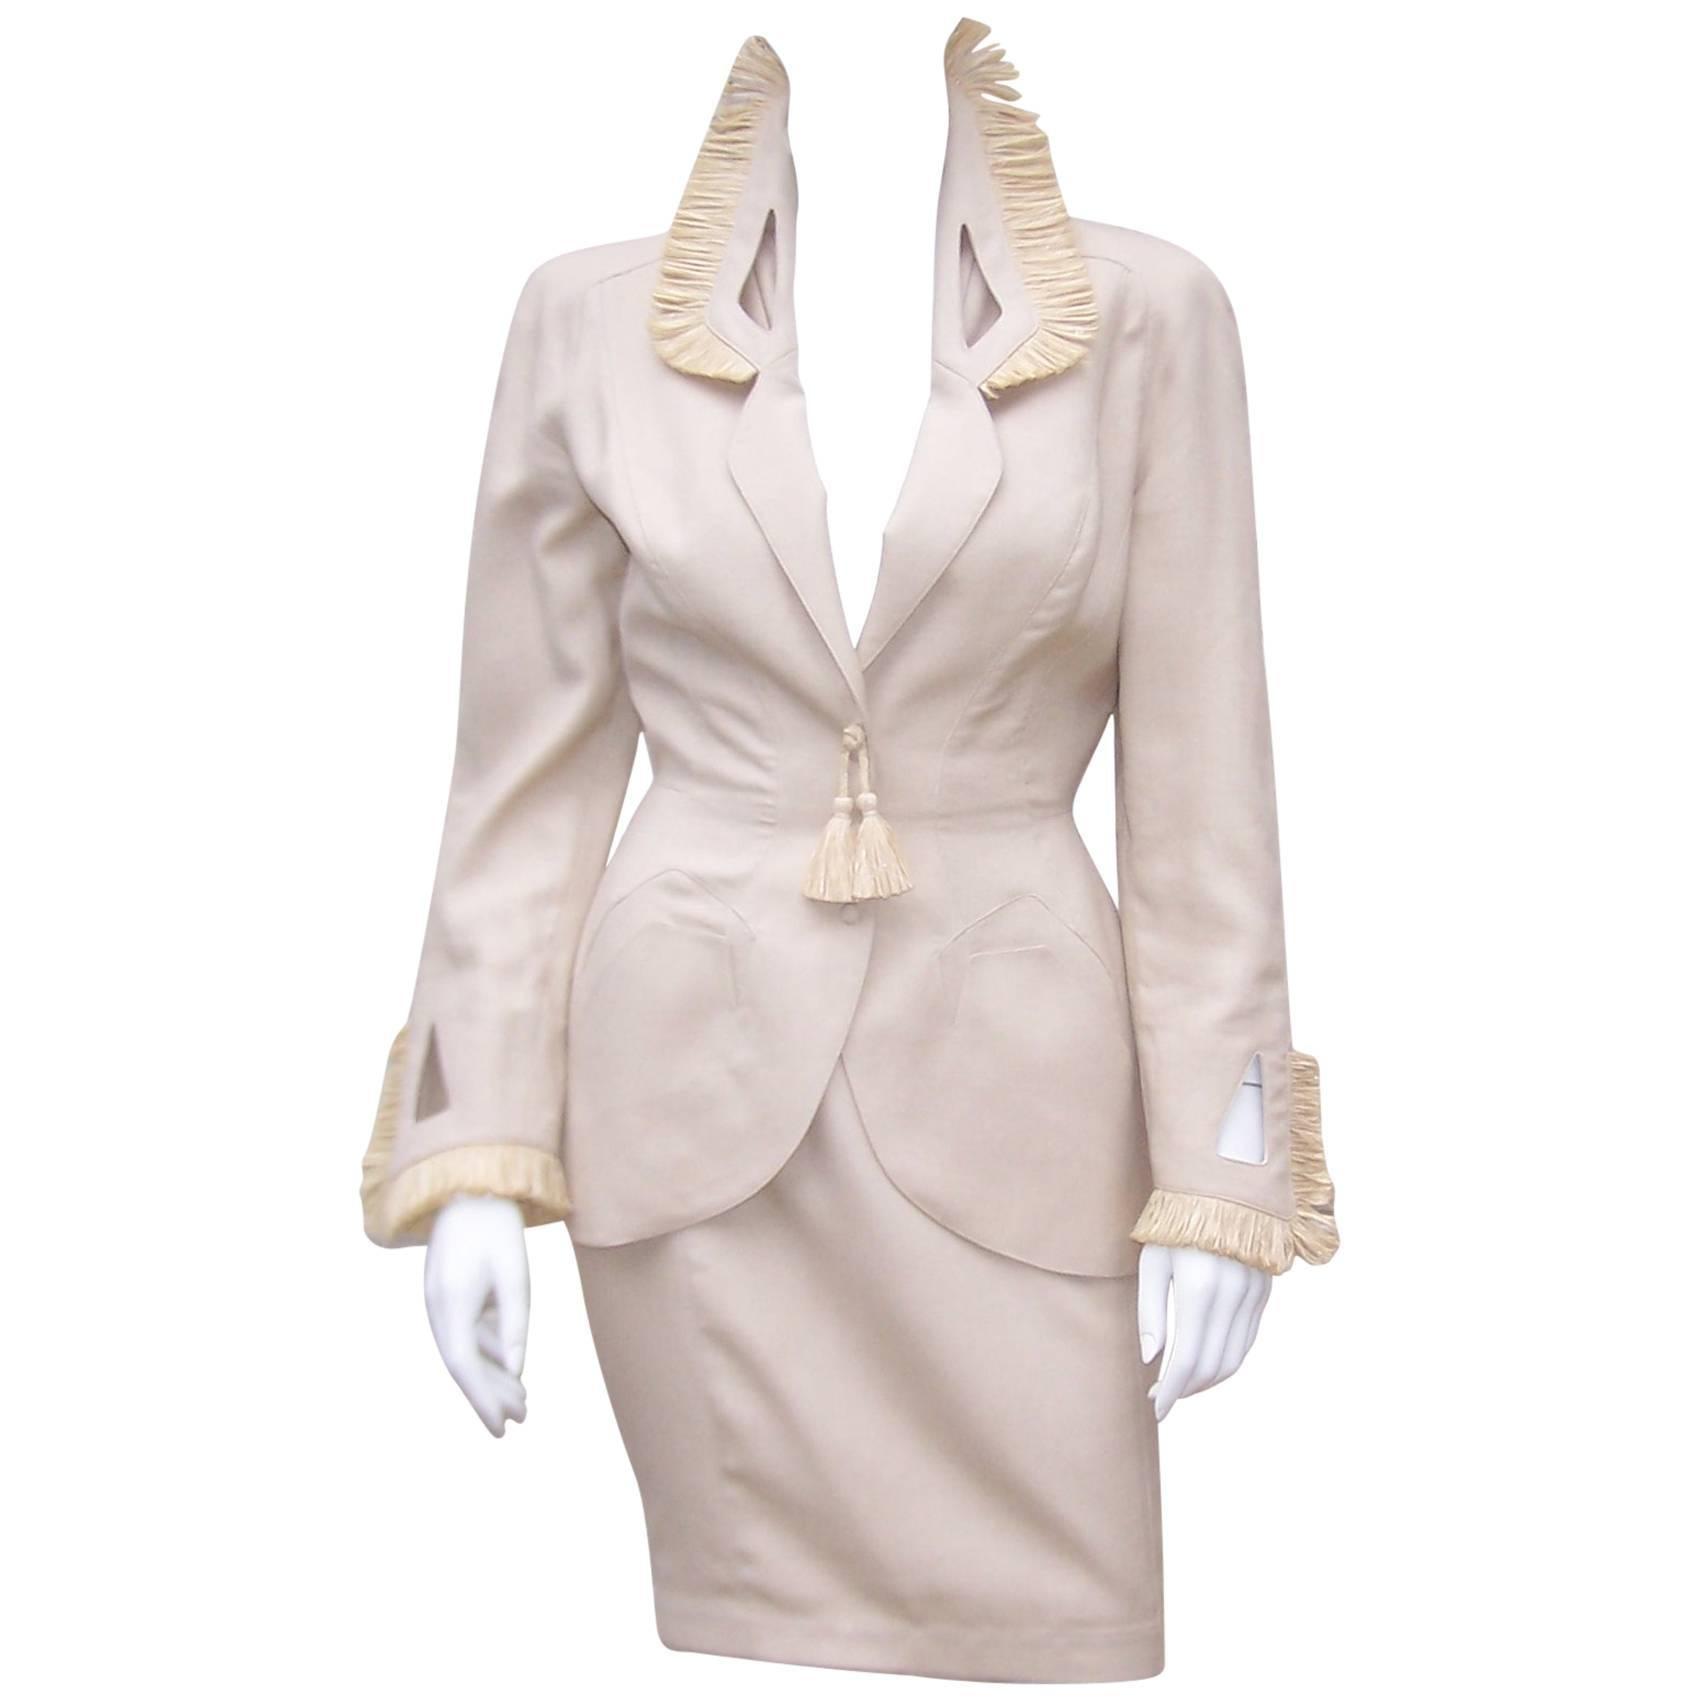 c.1990 Thierry Mugler Linen Skirt Suit with Raffia Trim